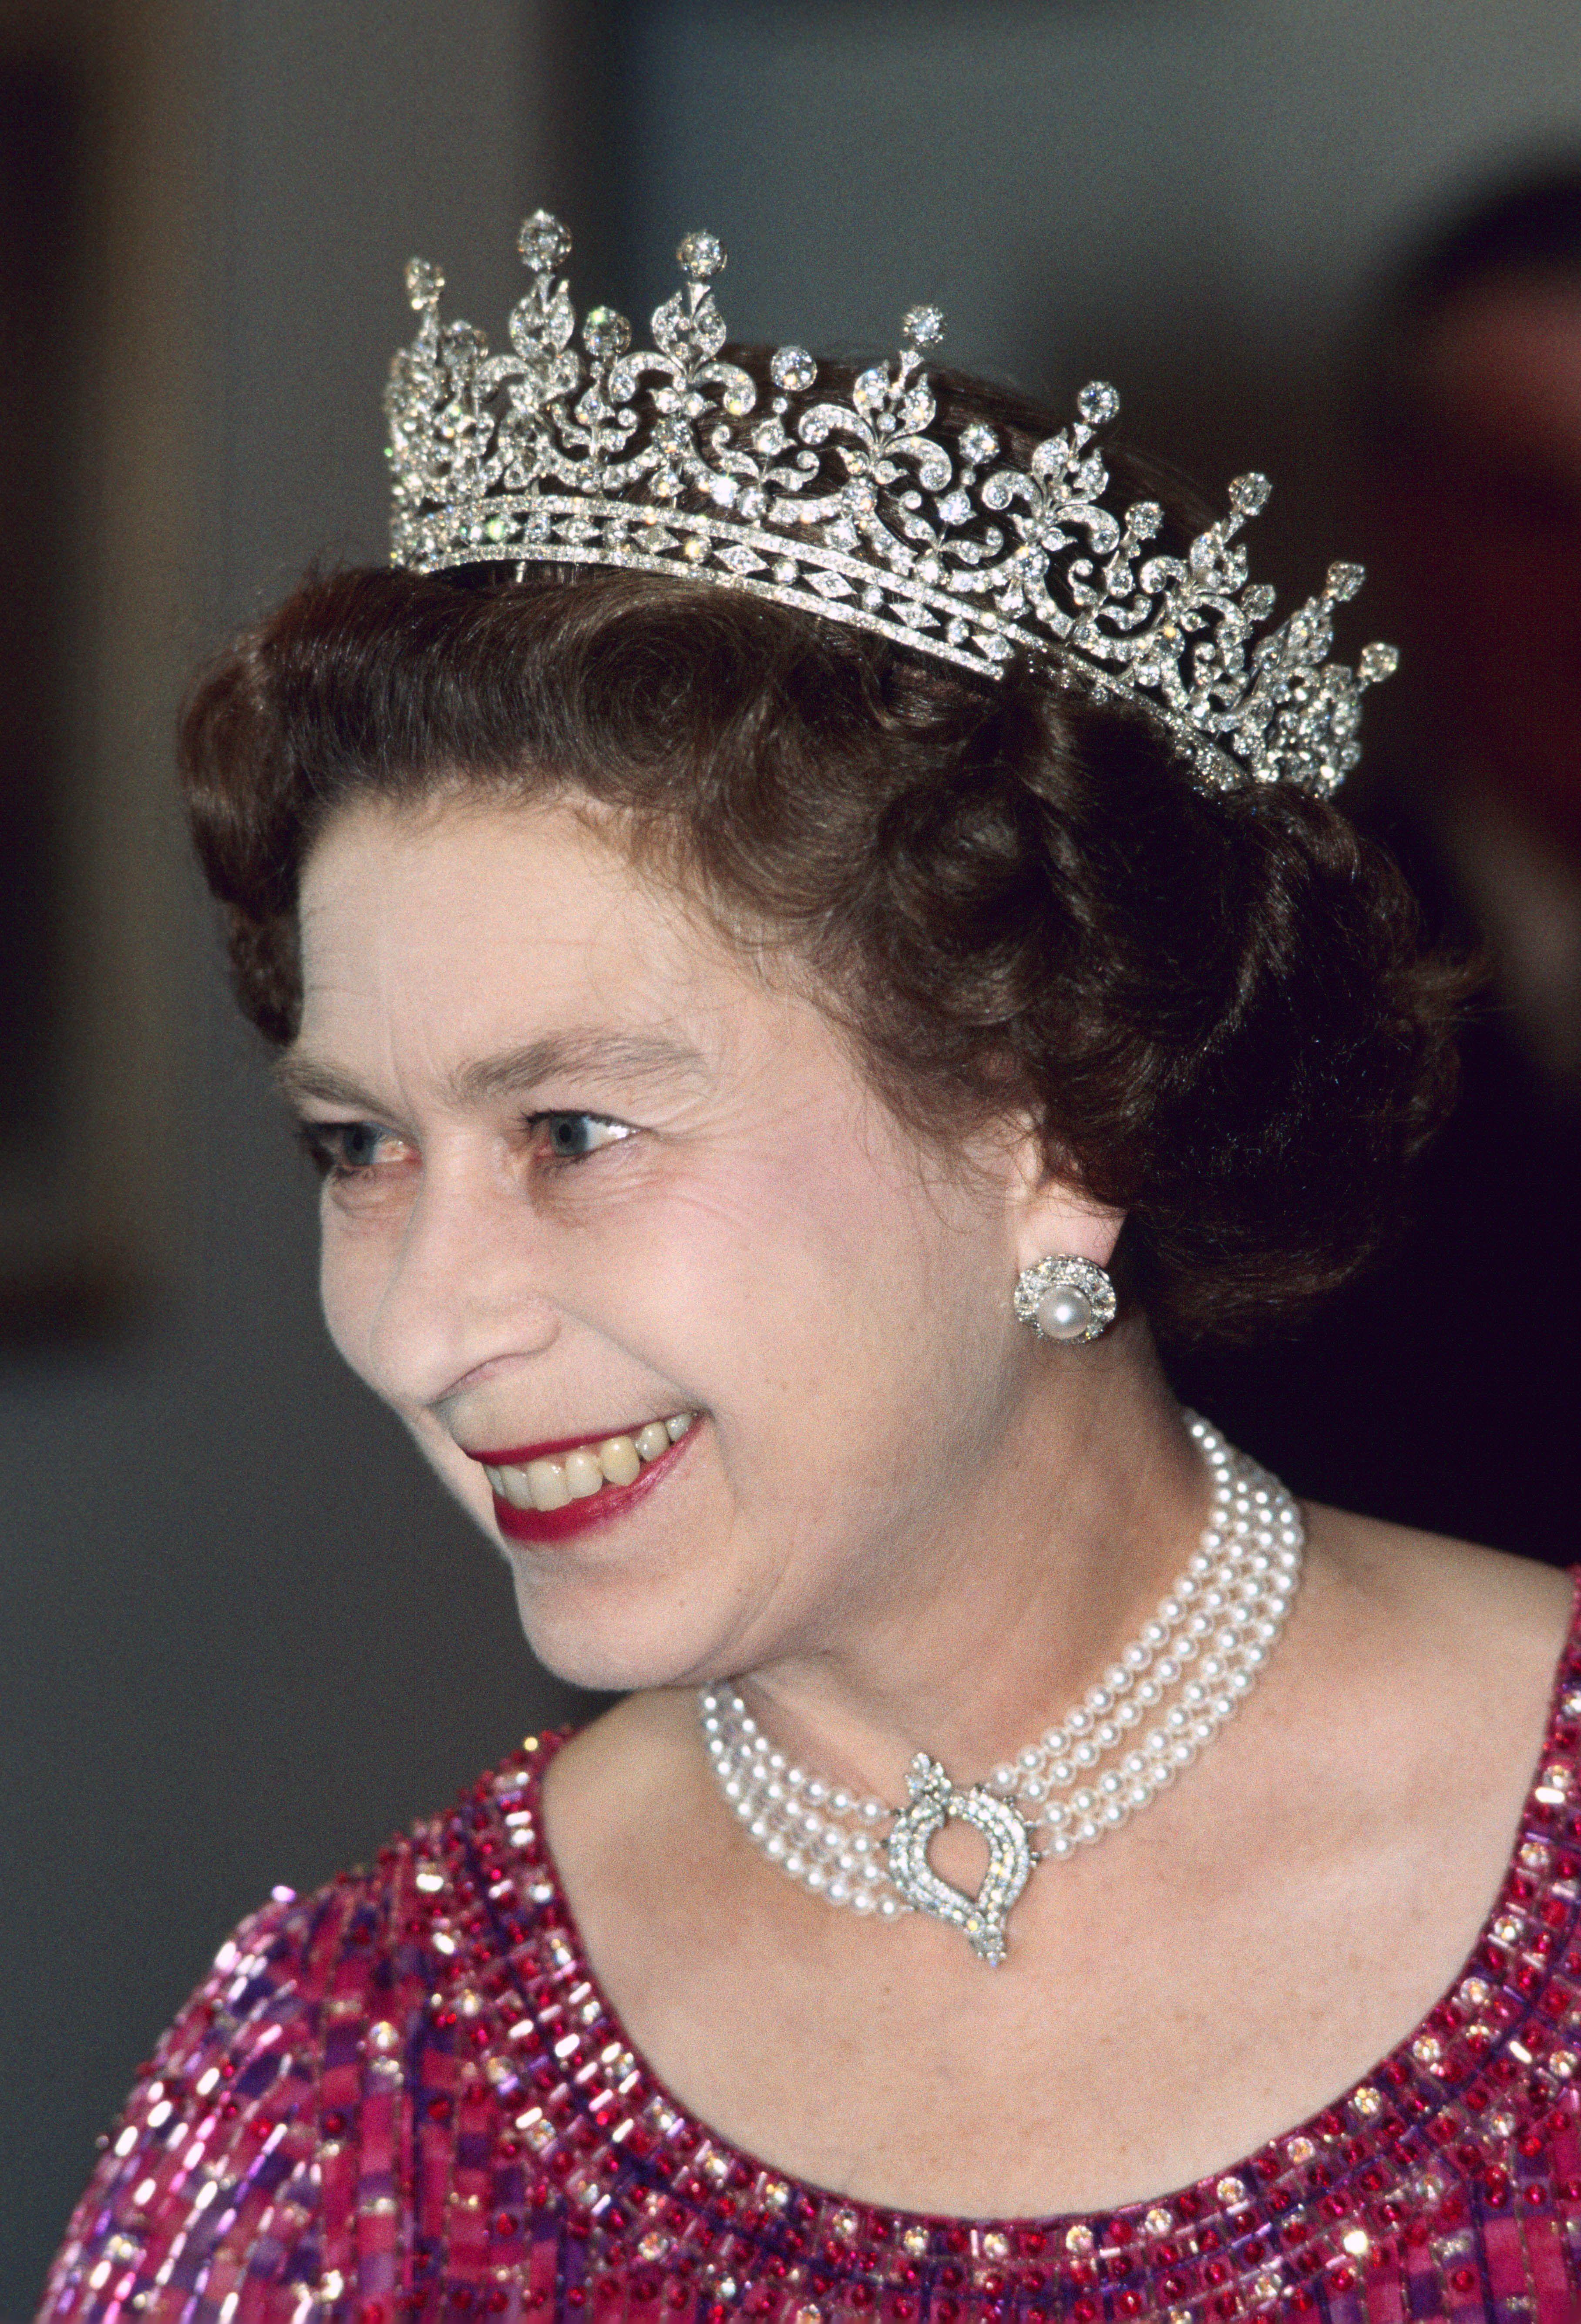 Queen elizabeths most beautiful jewels pictures of the queens queen elizabeths most beautiful jewels pictures of the queens tiaras crowns izmirmasajfo